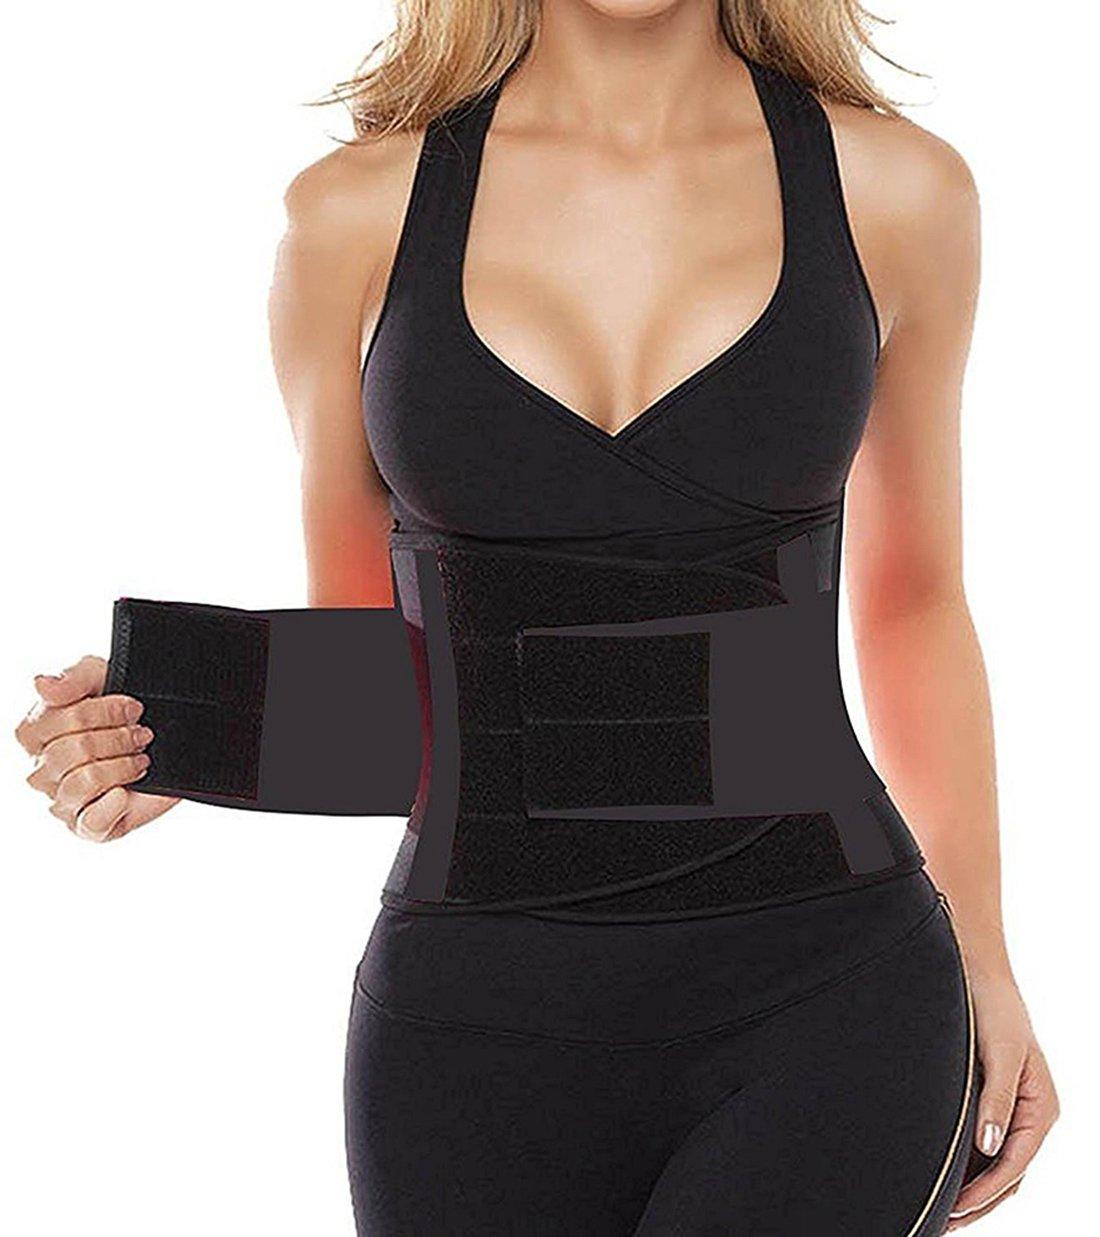 b729b4840c Free island Waist Trainer for Women Waist Cincher Weight Lost Waist Trimmer  Belt